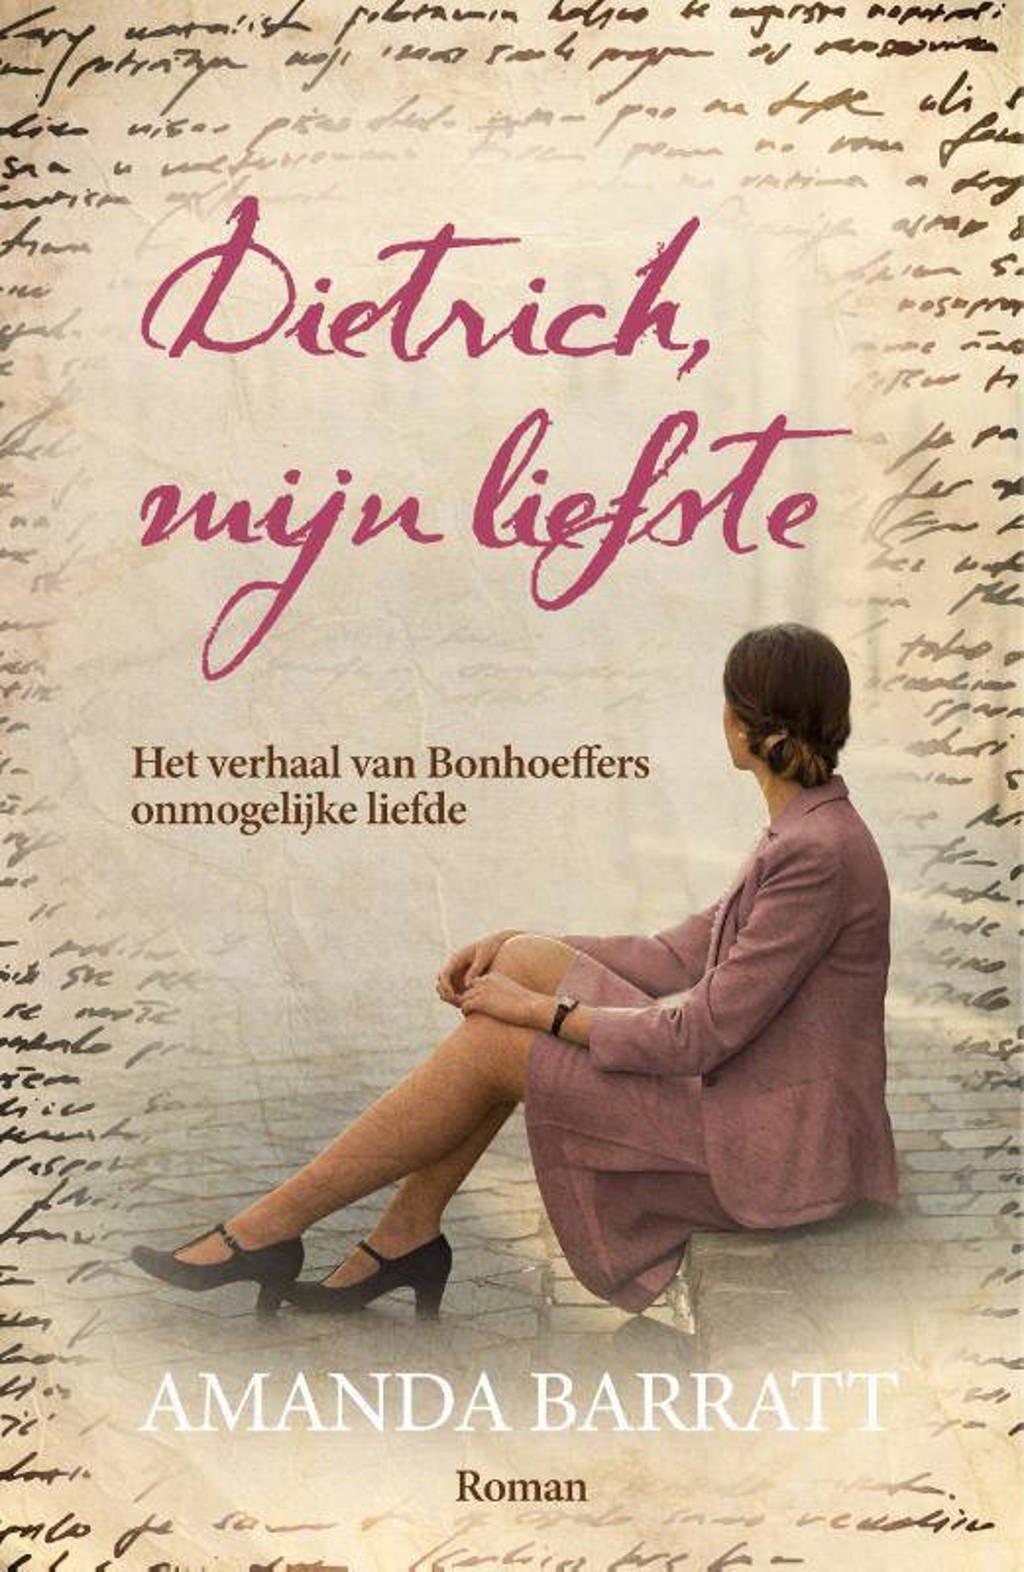 Dietrich, mijn liefste - Amanda Barratt